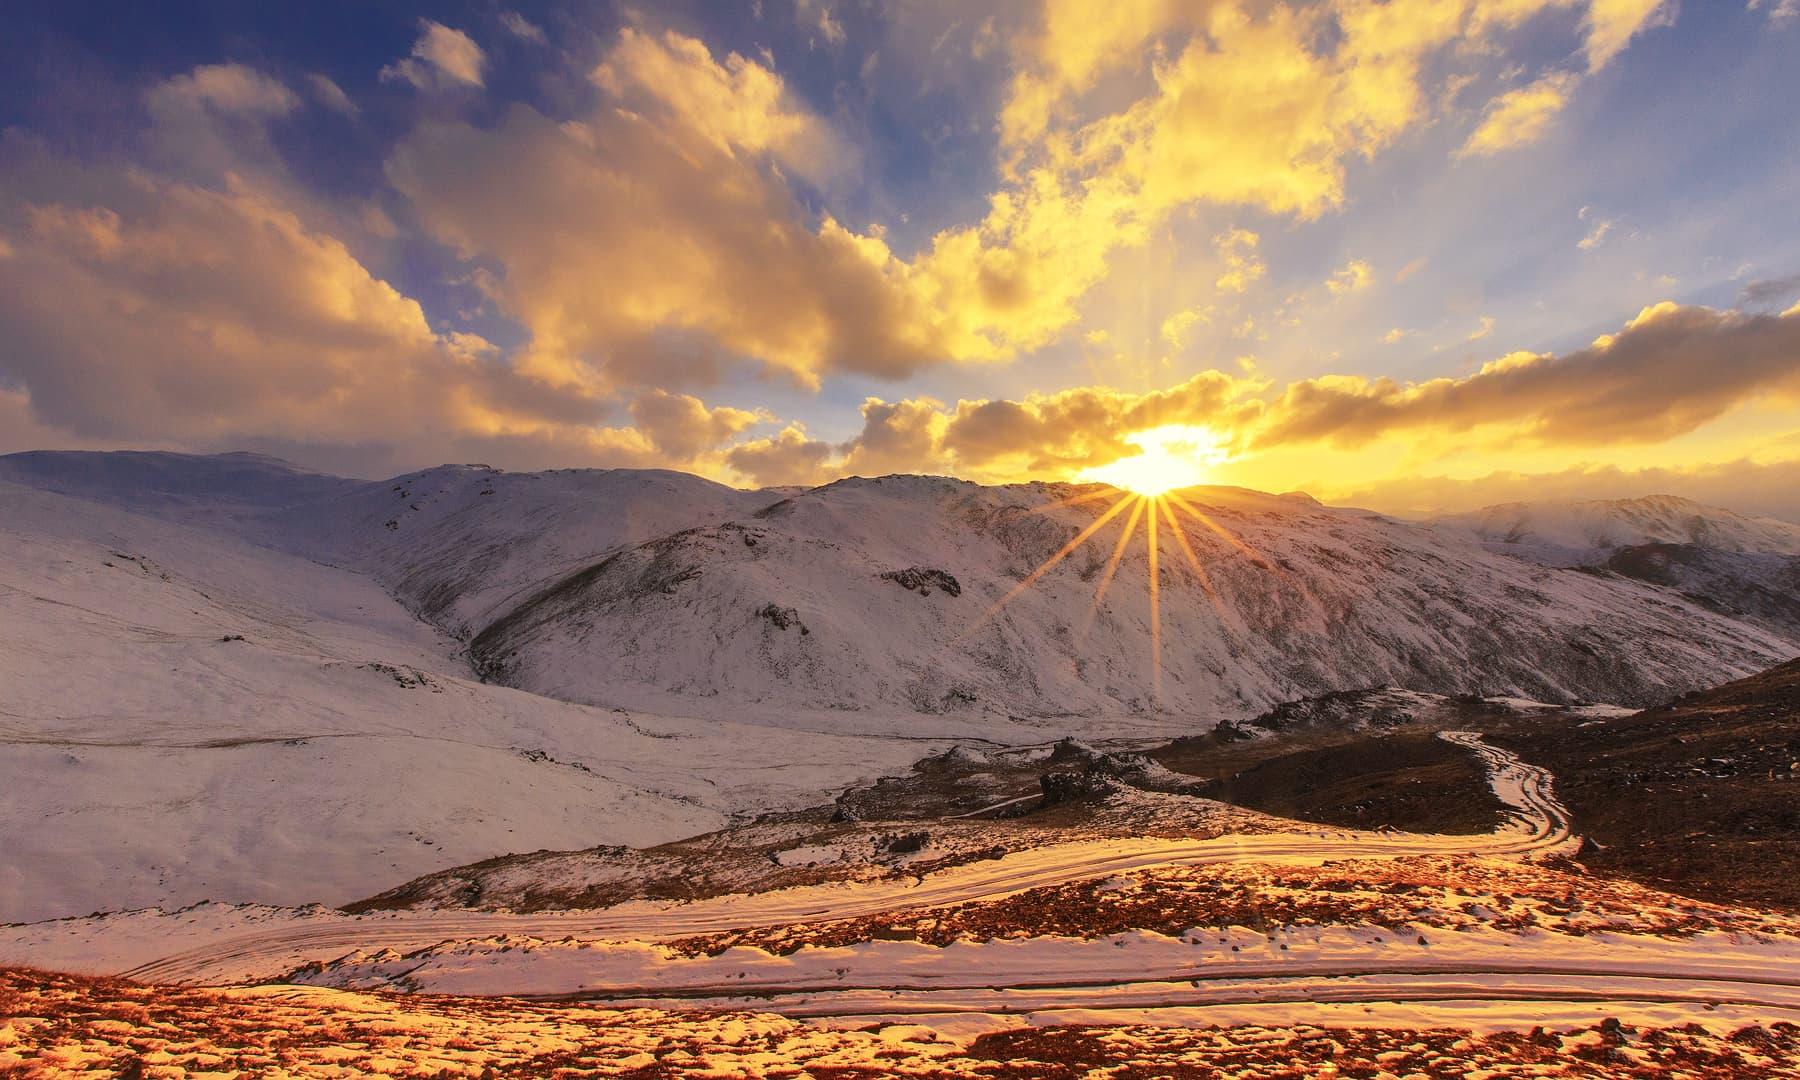 Sunset at Chillam